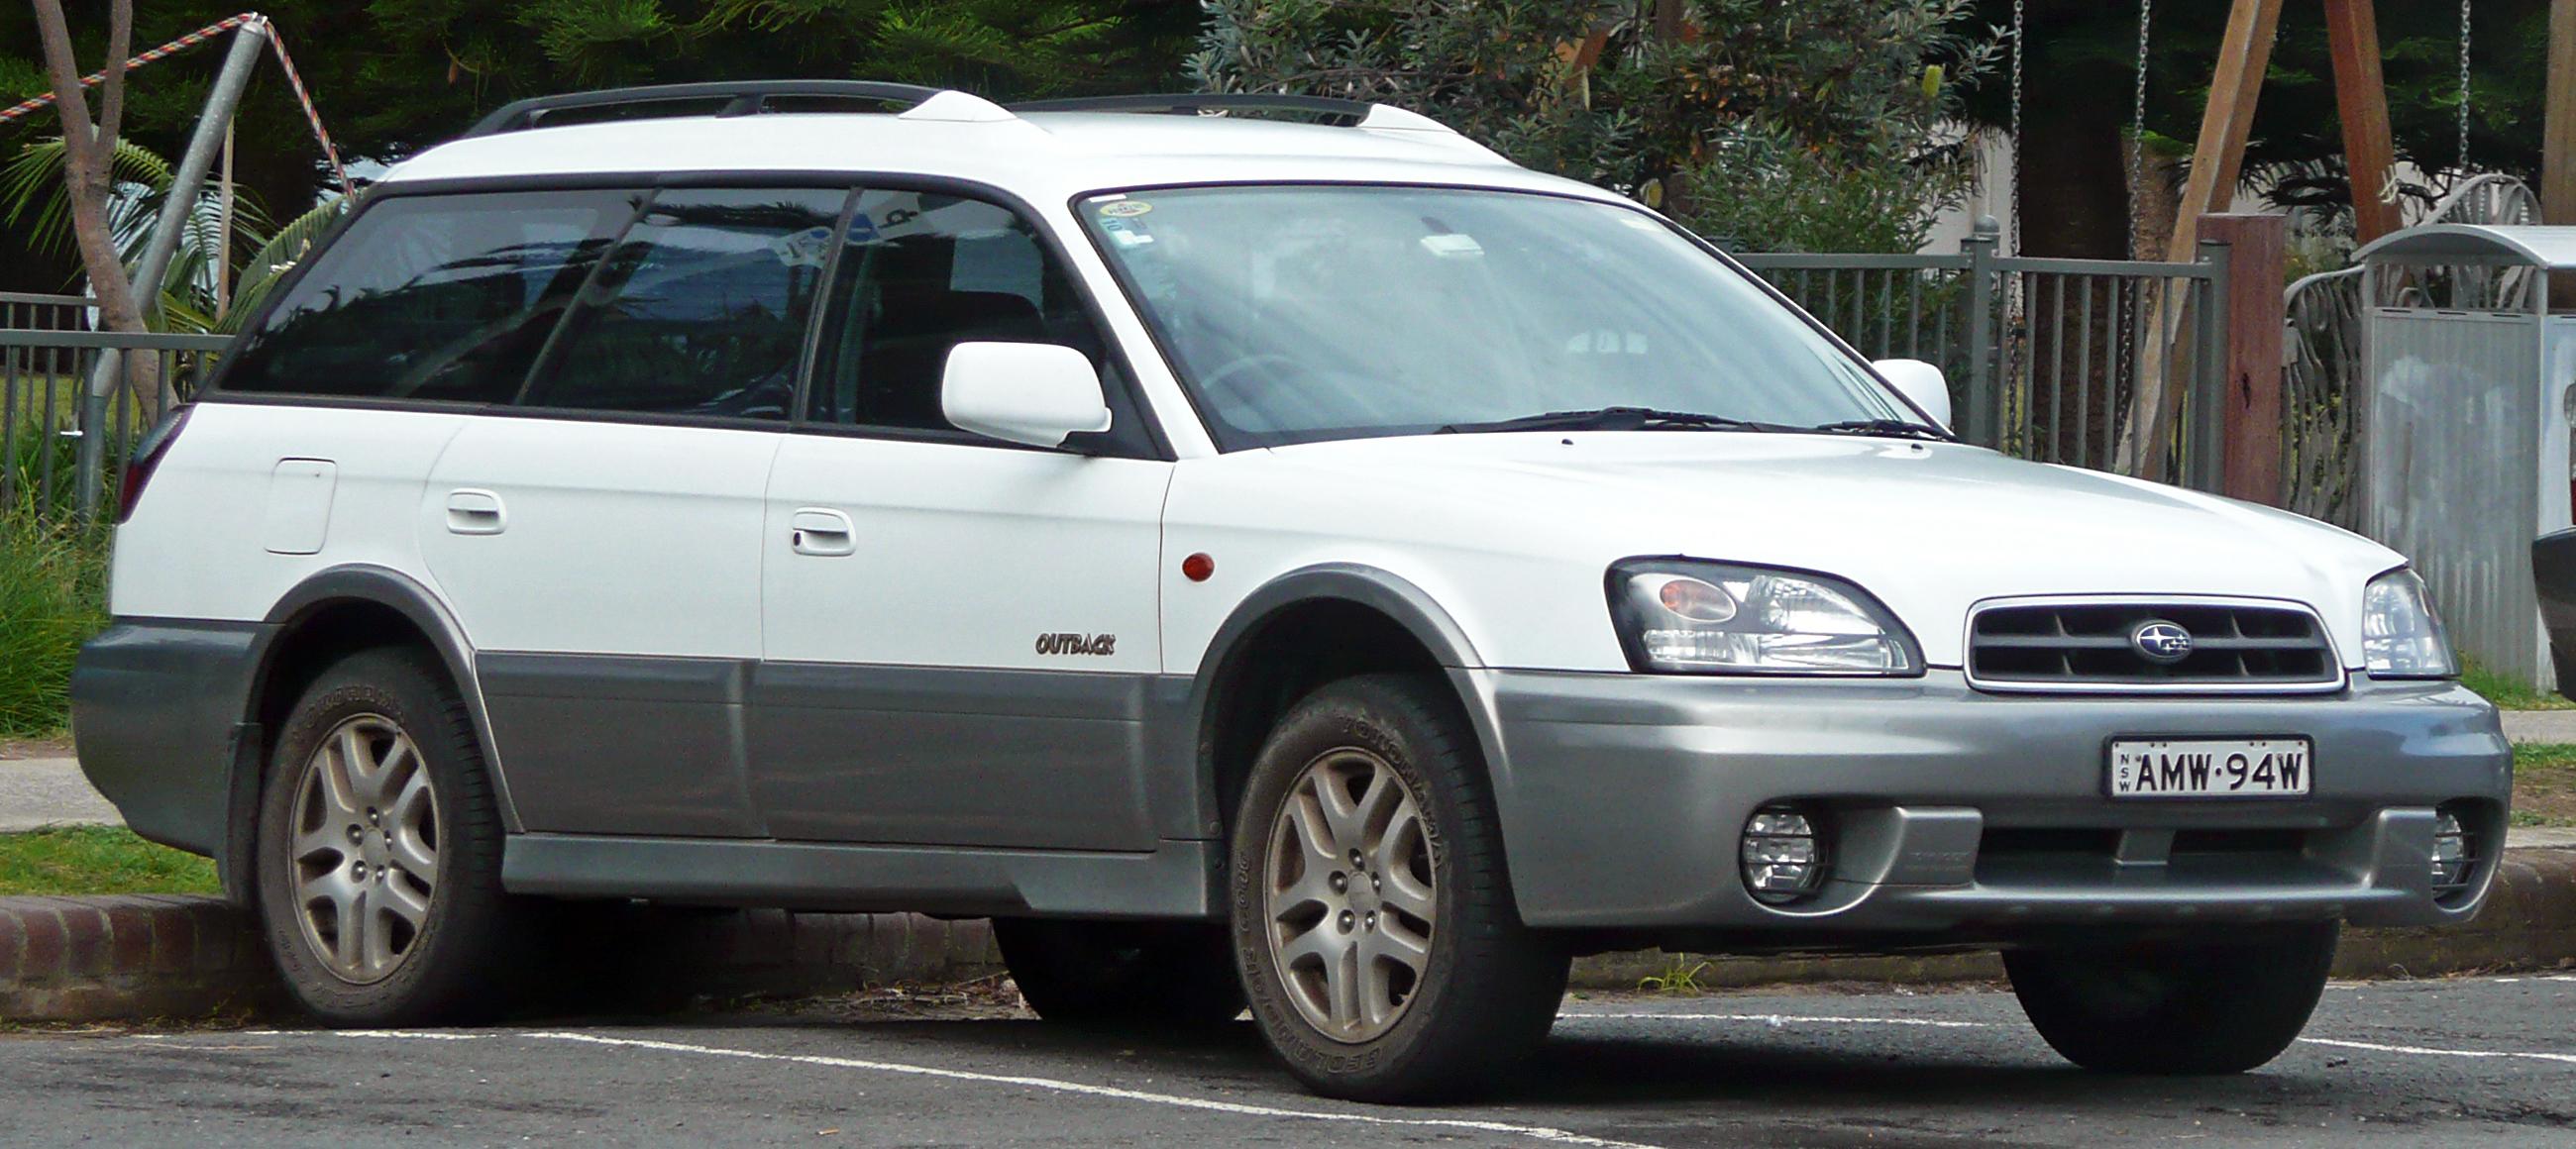 file 2002 subaru outback bh9 my03 station wagon 2010 06 17 jpg wikimedia commons. Black Bedroom Furniture Sets. Home Design Ideas